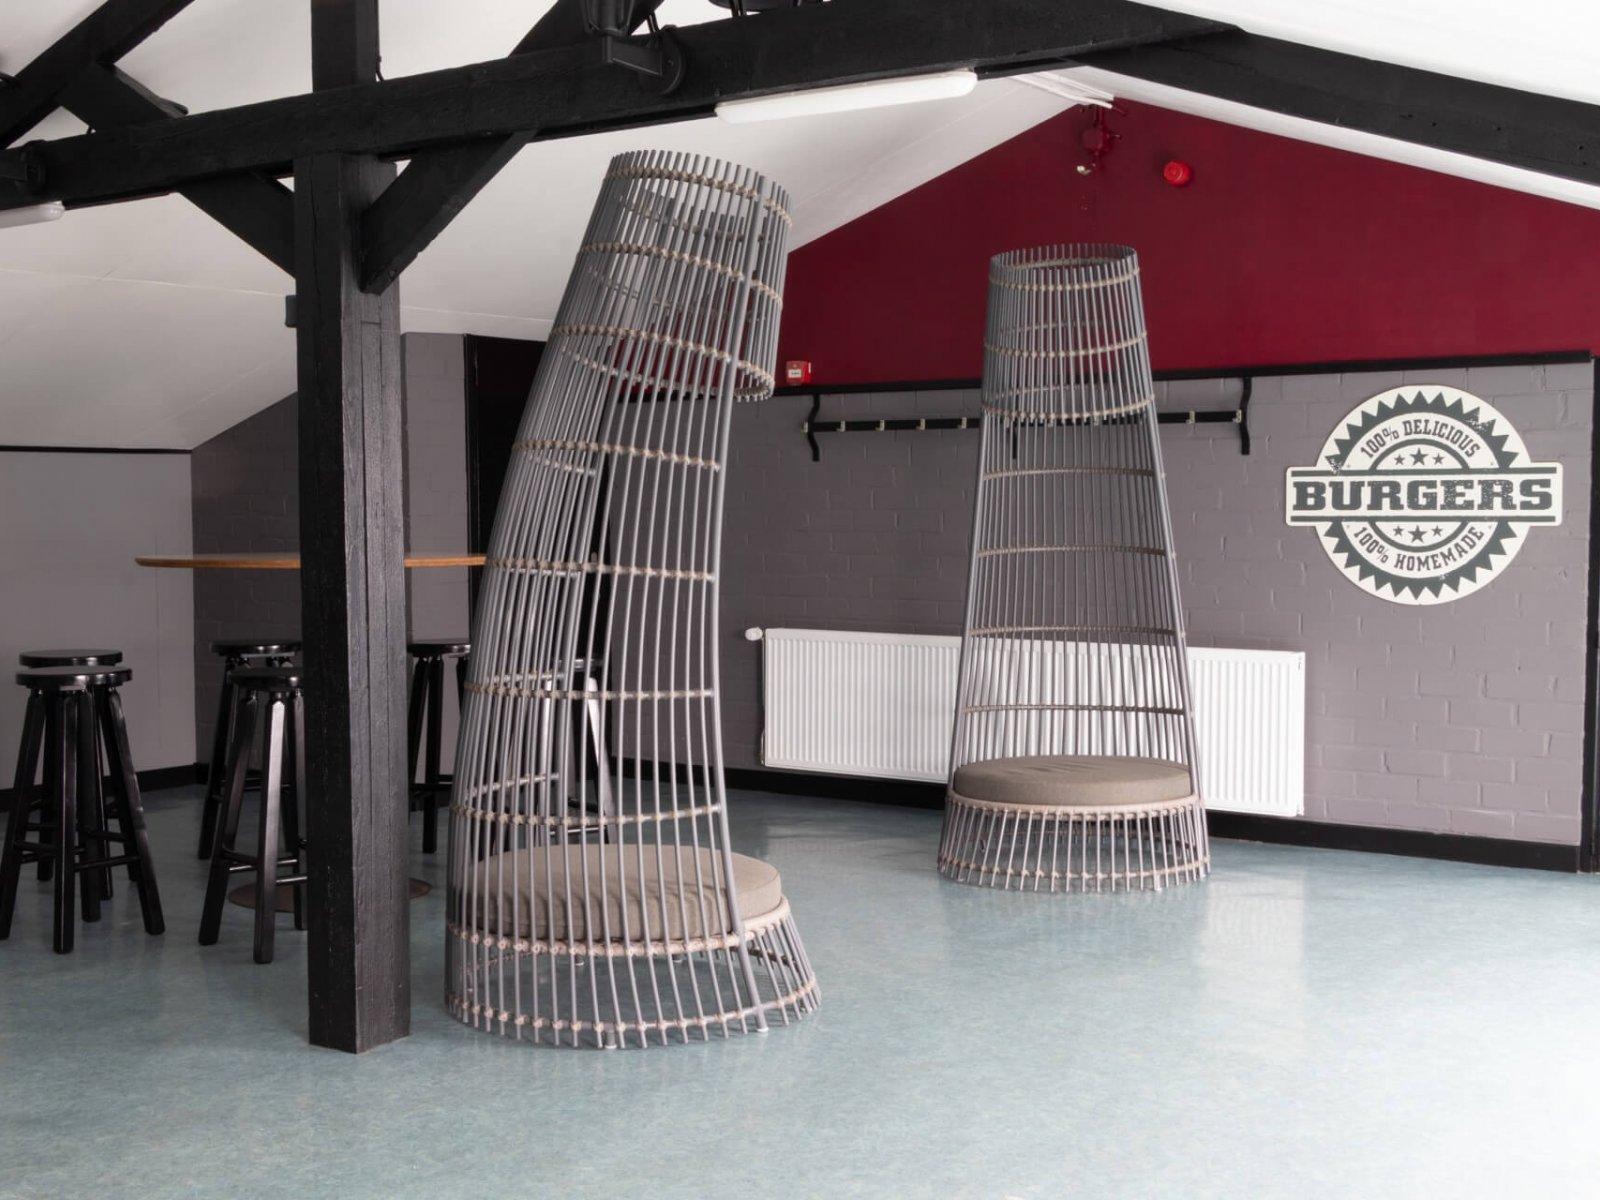 Kampeerboerderij-De-Reehoeve-Groepsaccommodatie-De-Reebok-recreatieruimte-boven-e3